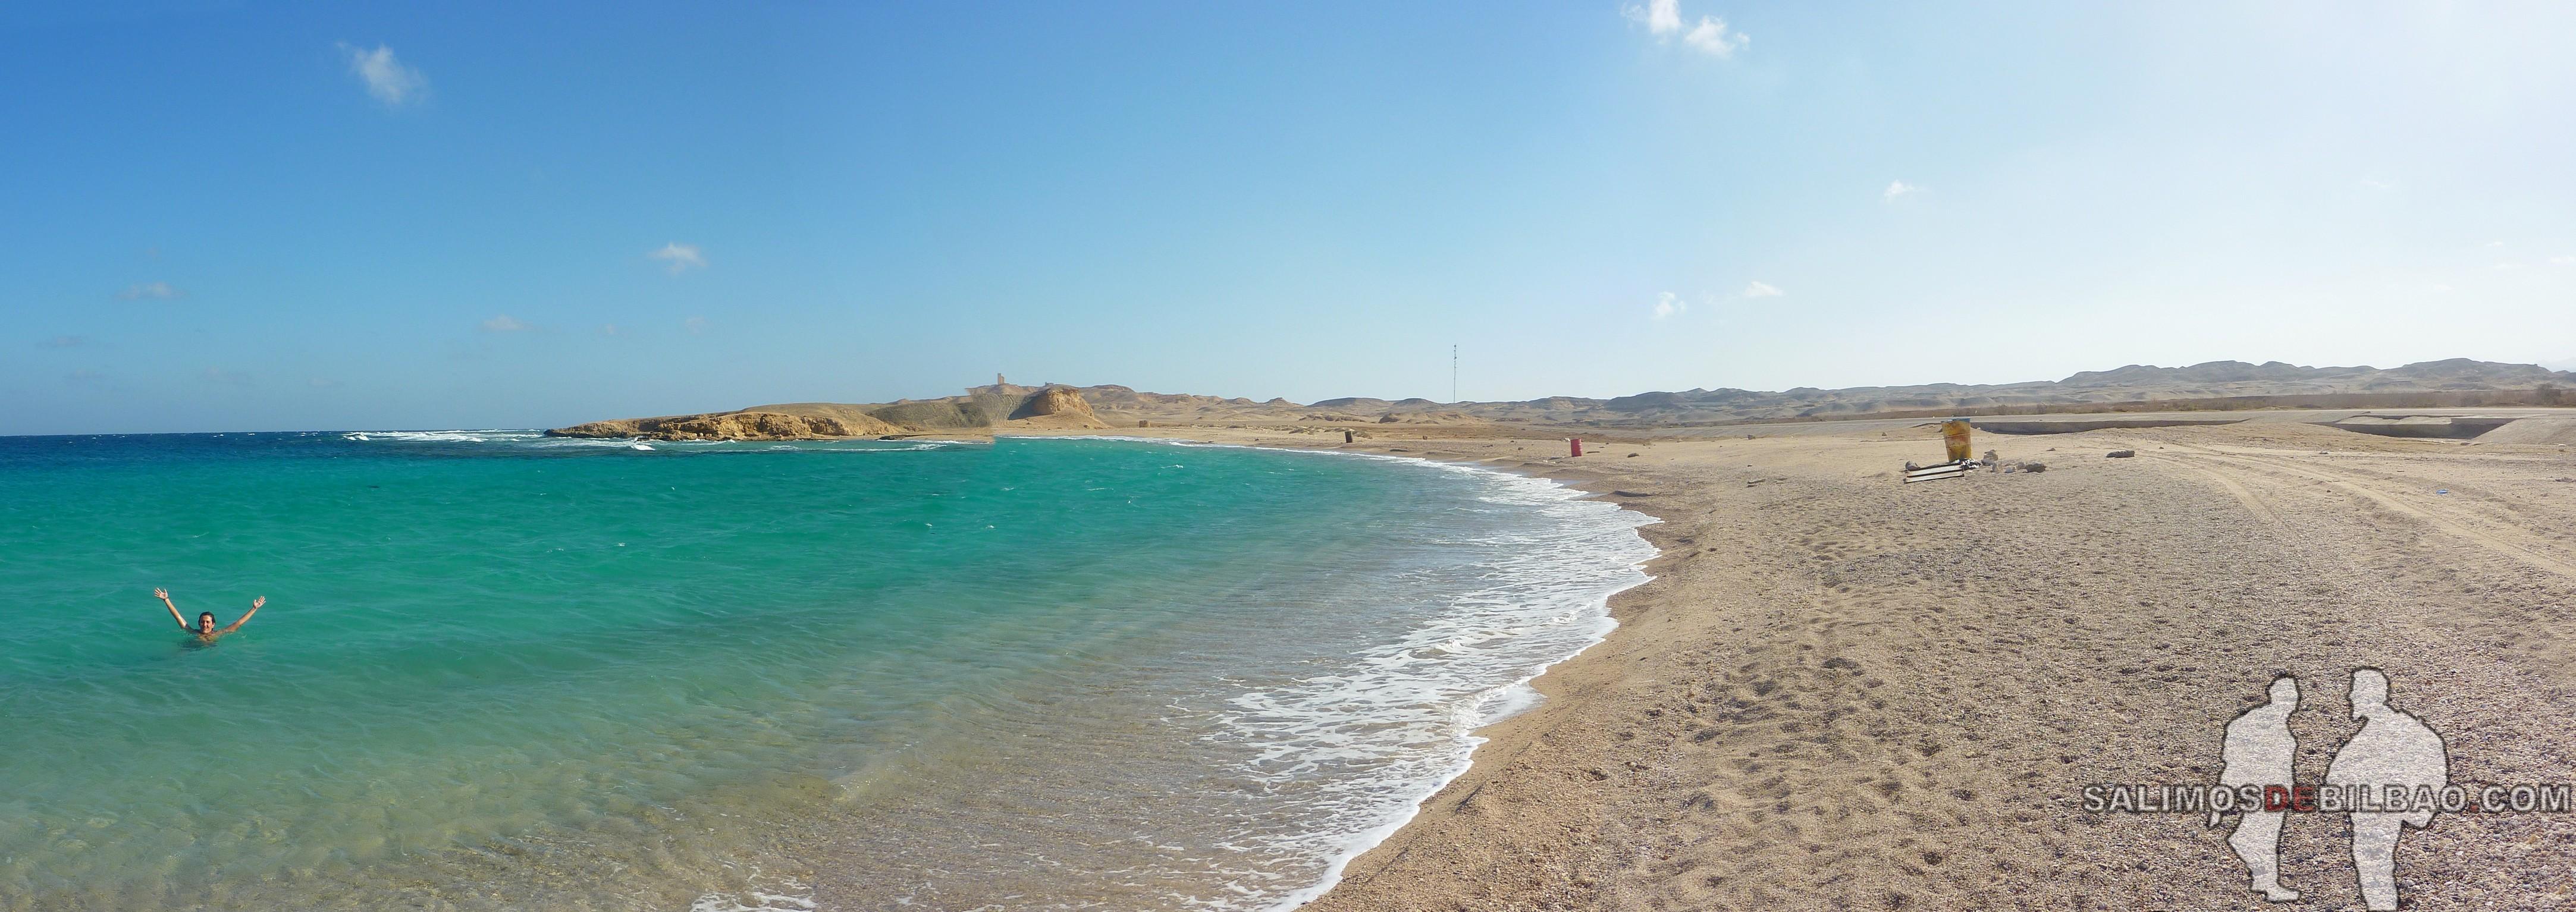 1085. Saioa, Playa 7 kilo, Marsa Alam